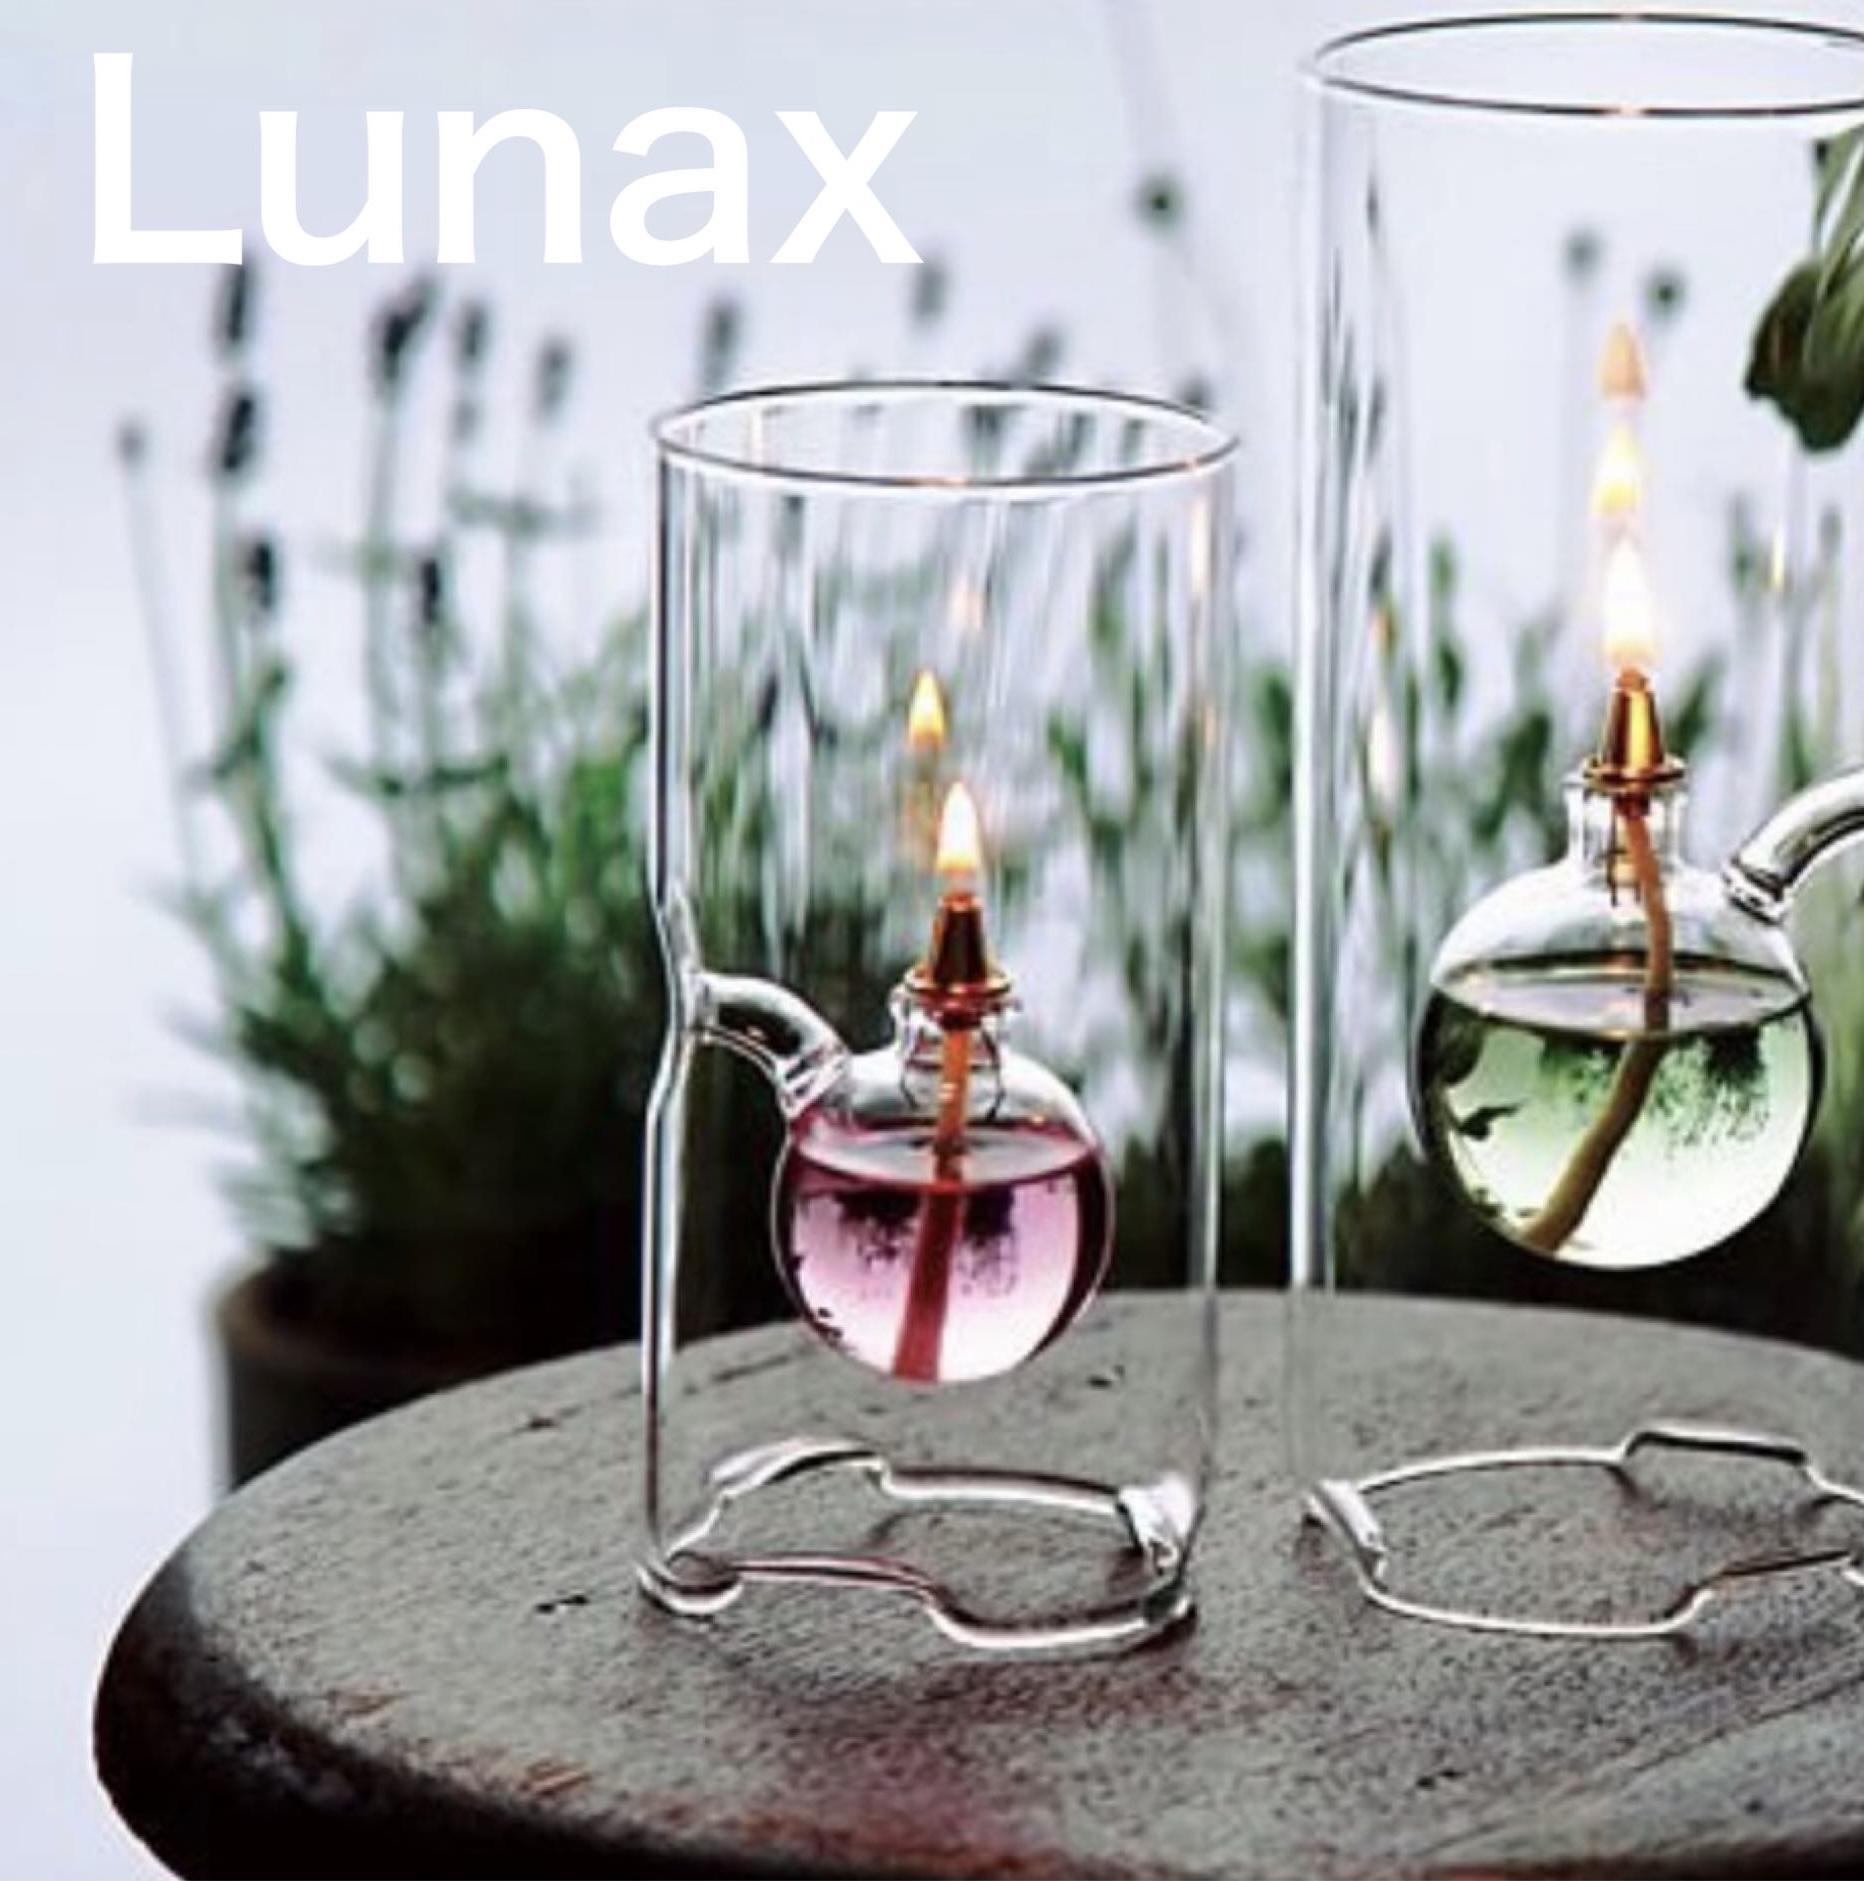 Lunax OLC-01 新発売 オイルランプ ガラスランプ ルナックス 在庫処分 クリアランプ 店内装飾 間接照明 インテリア照明 パーティー テーブルウェア